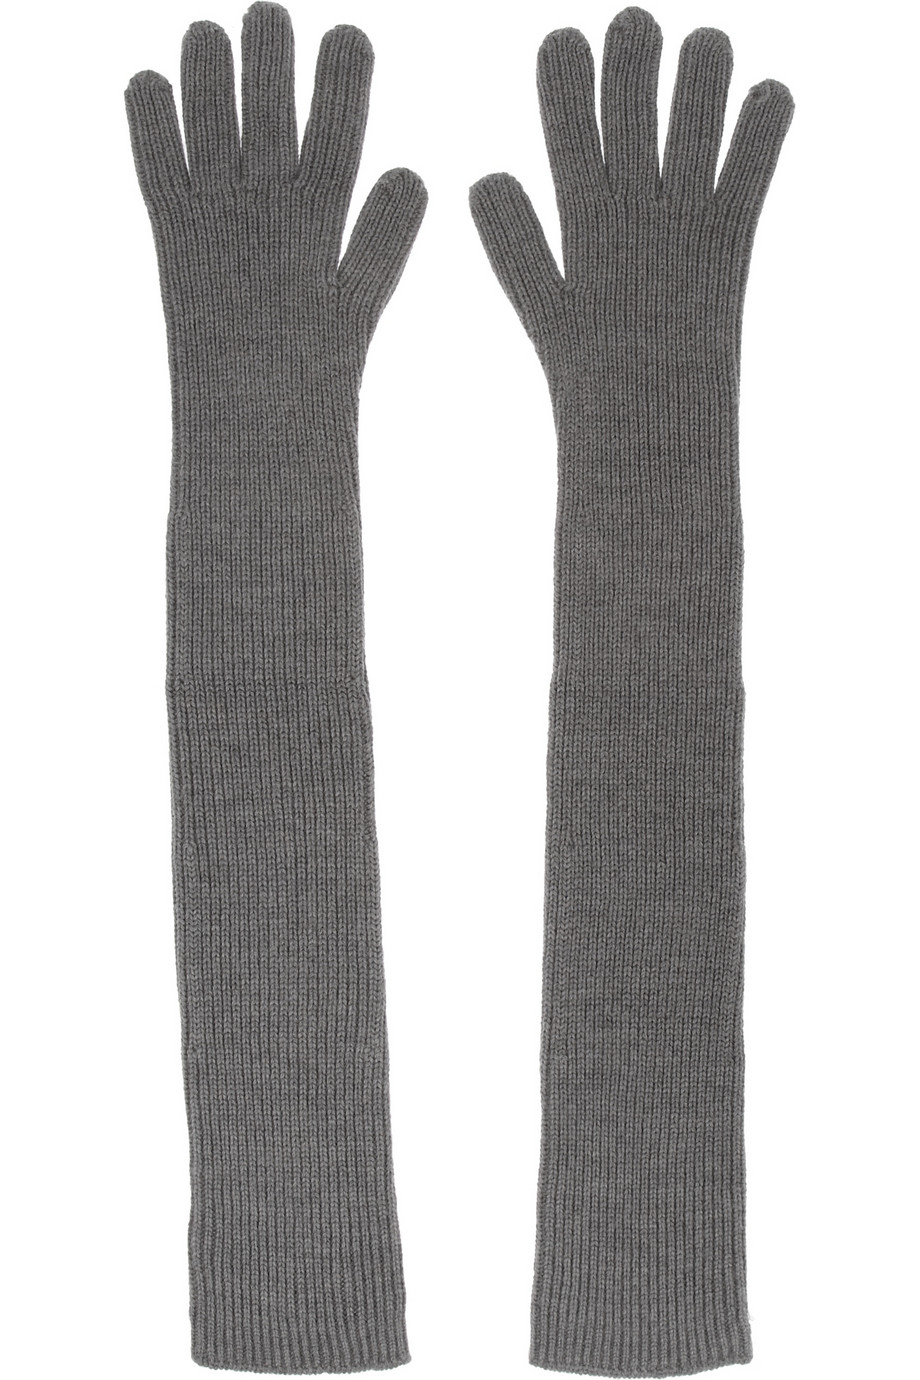 623dfe15d Lyst - Stella McCartney Ribbed Wool Gloves in Gray